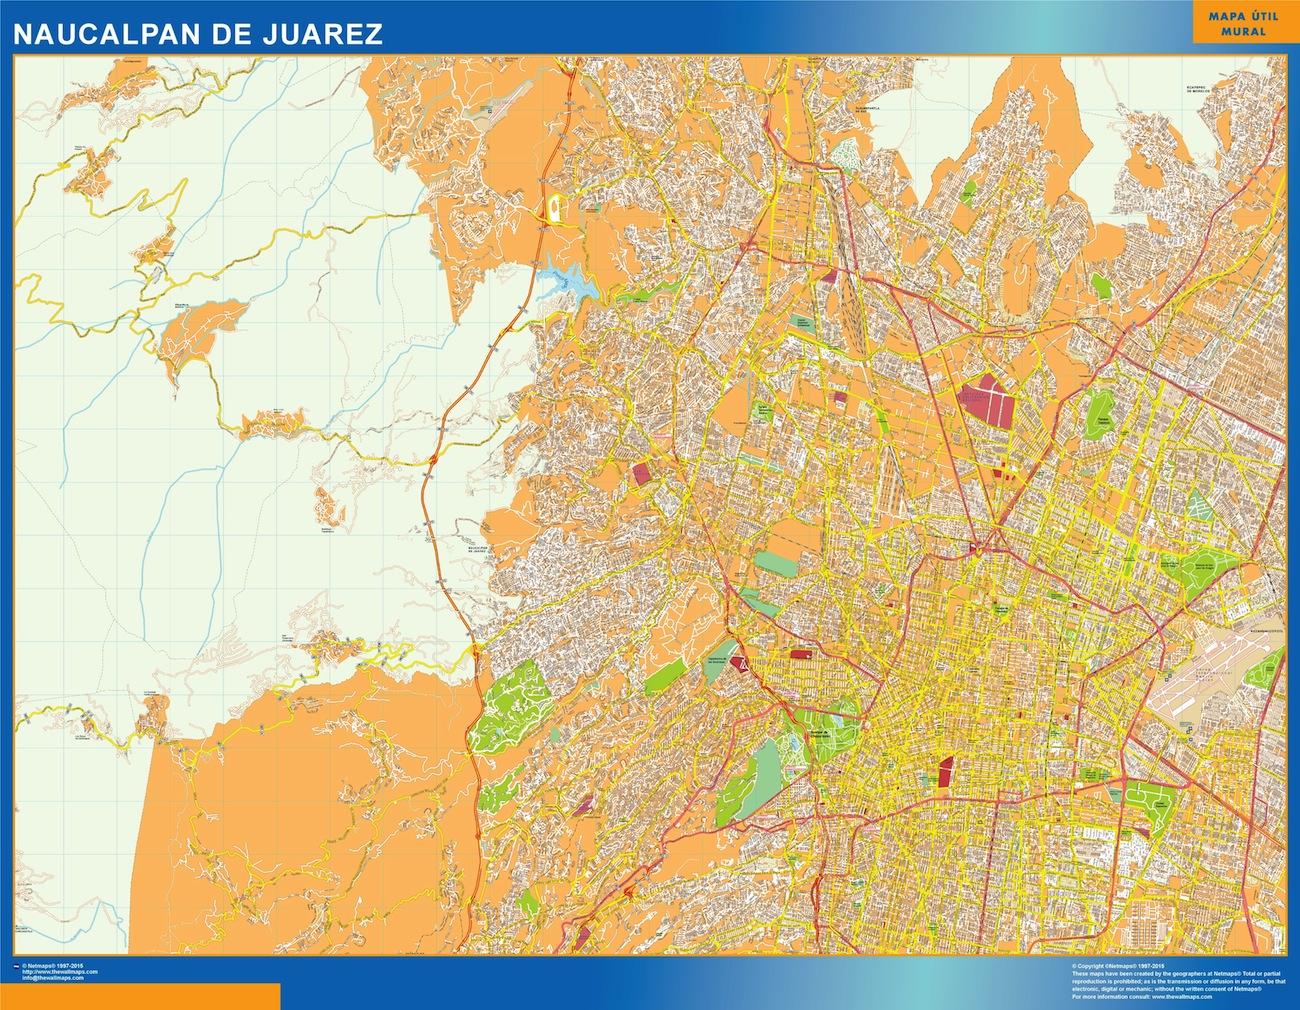 Mapa Naucalpan De Juarez en Mexico plastificado gigante